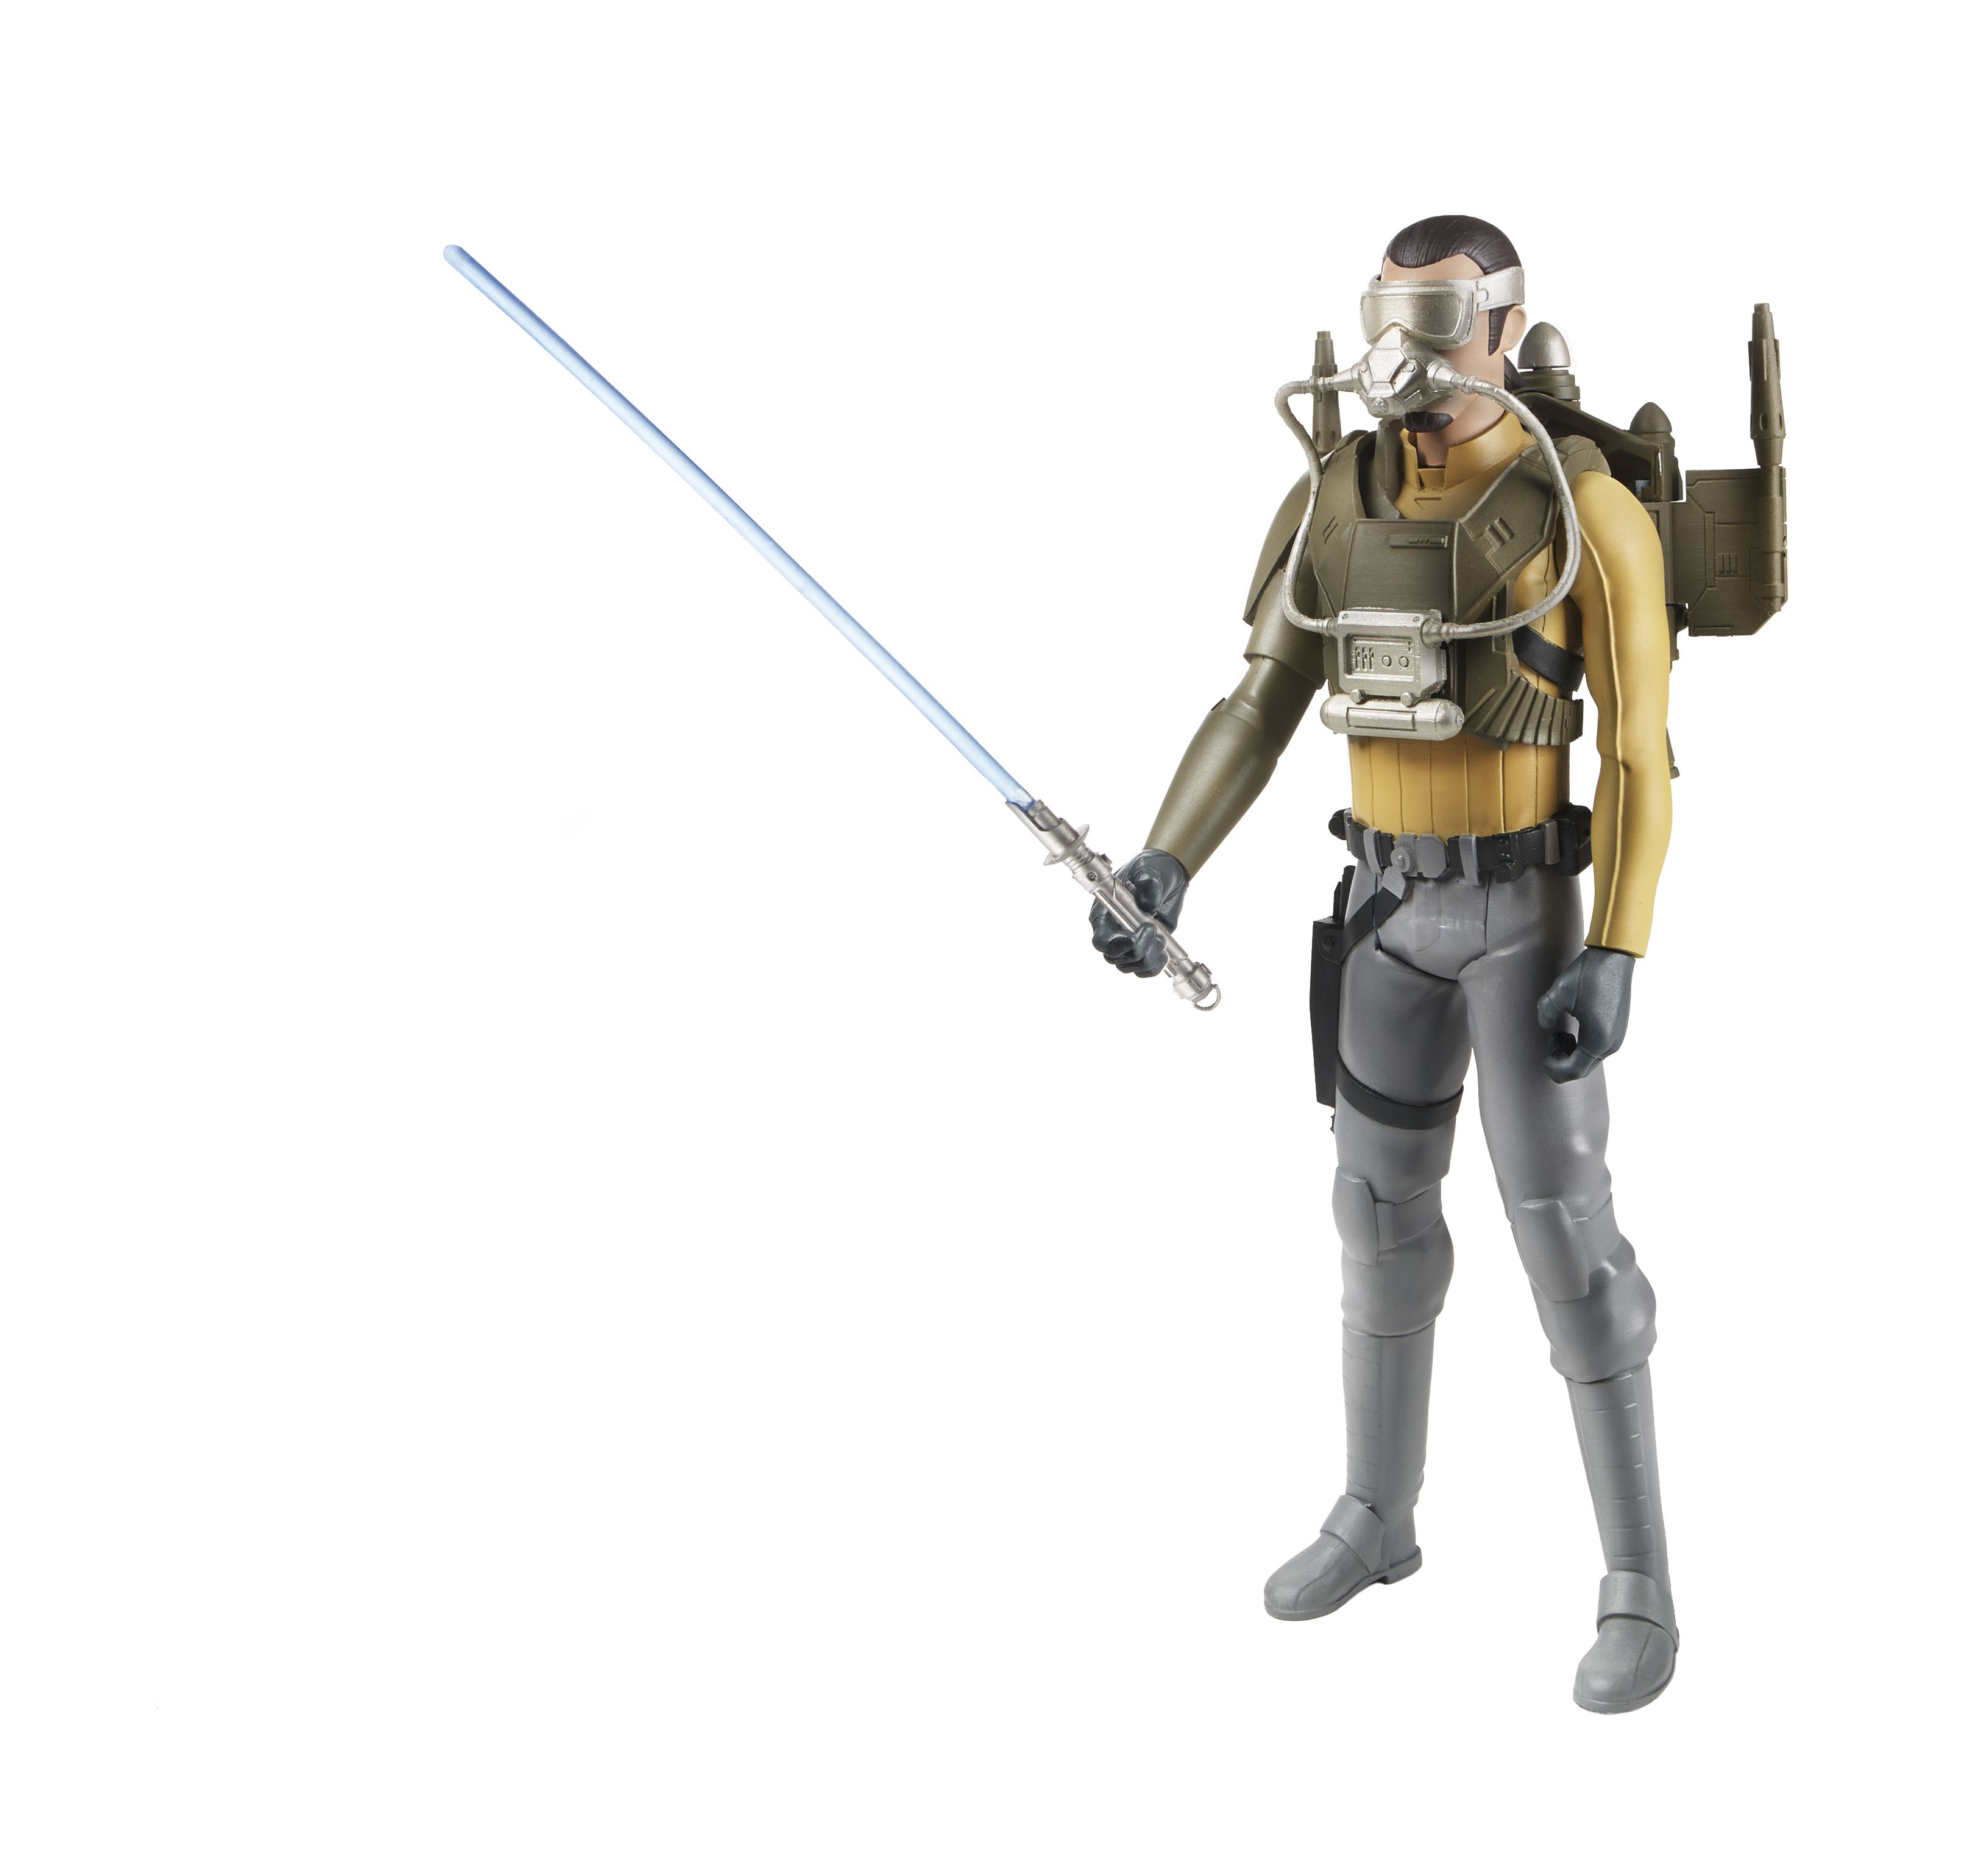 Image - Kanan hasbro figure I.jpg - Star Wars Rebels Wiki